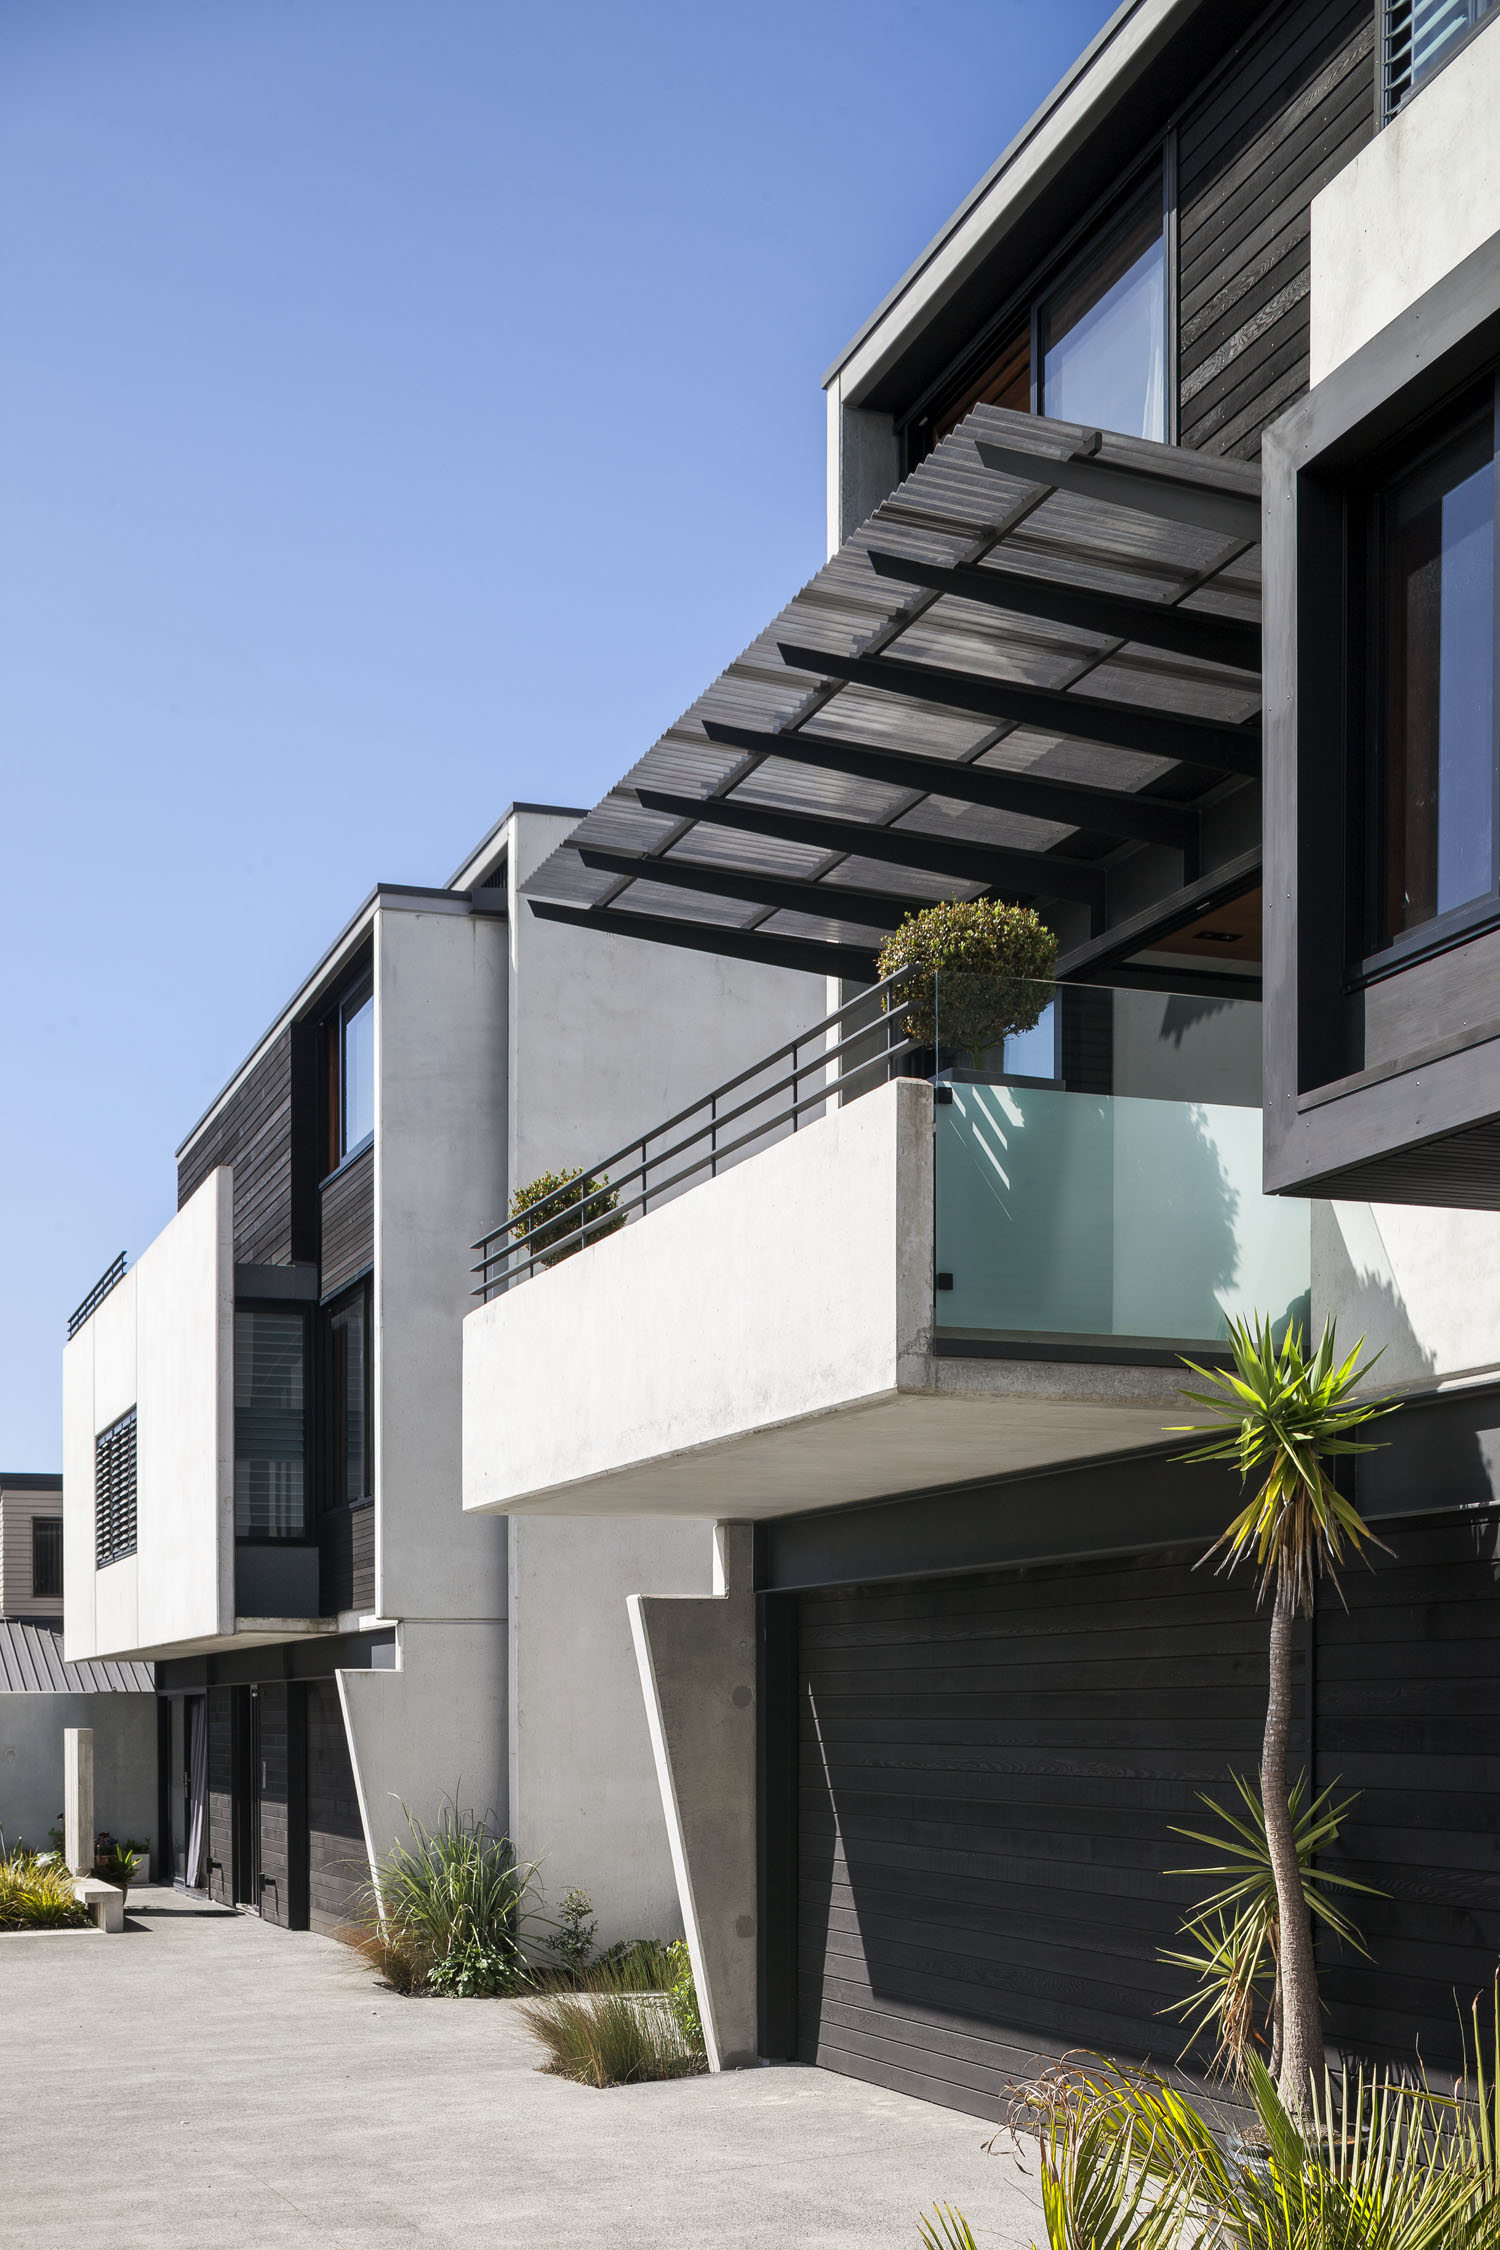 Gerrard Hall townhouse design shows durability and flexibility